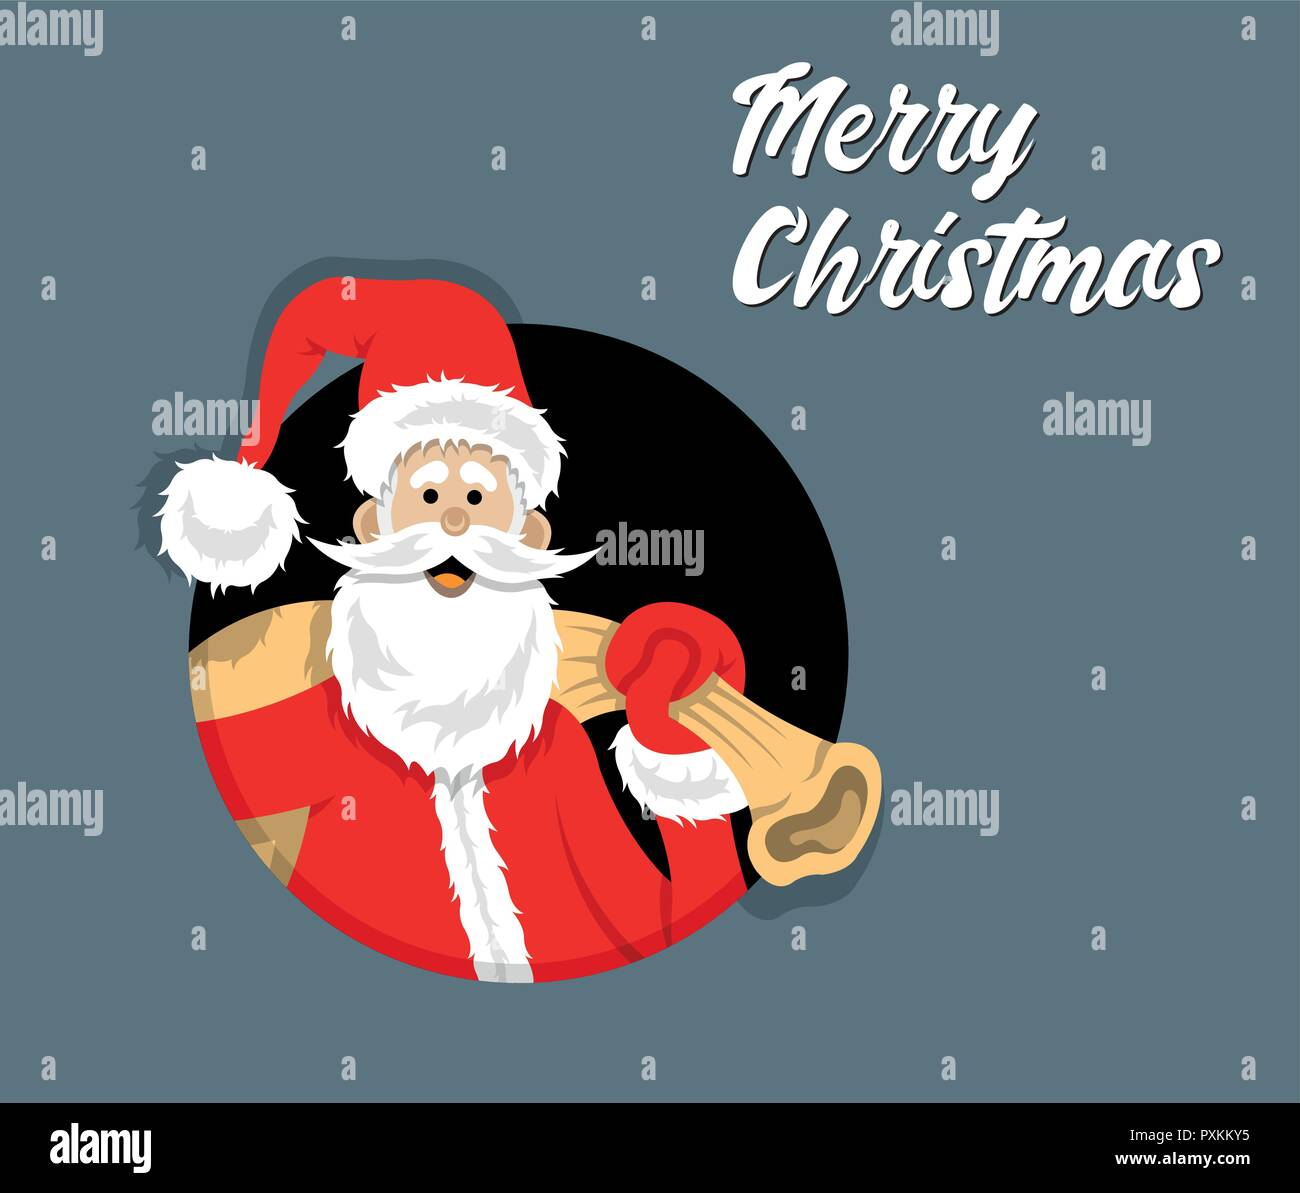 Christmas Celebration Cartoon Images.Santa Claus Cartoon Inside Circle With Christmas Celebration